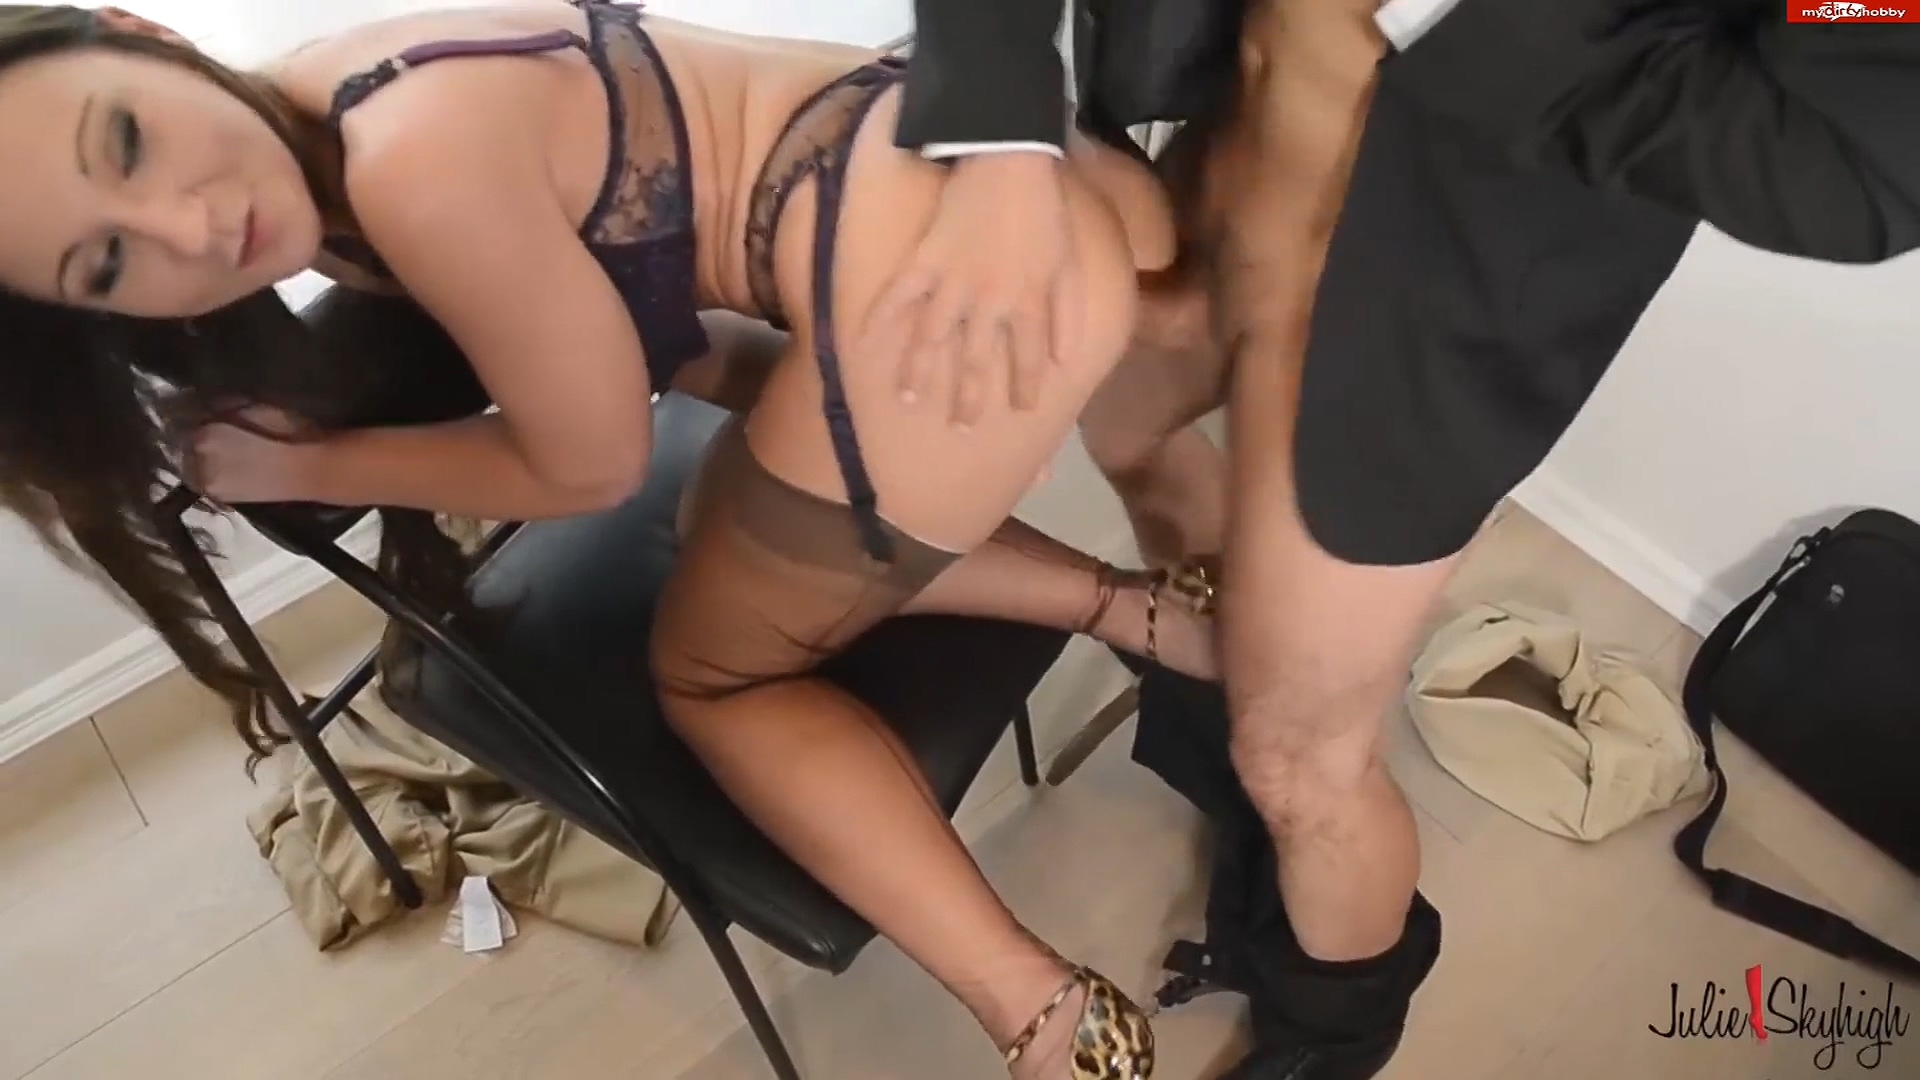 THE BOSS IS A BITCH FULL MOVIE anal fuck by my employee mit julieskyhigh.mp4_20191105_084248.328.jpg